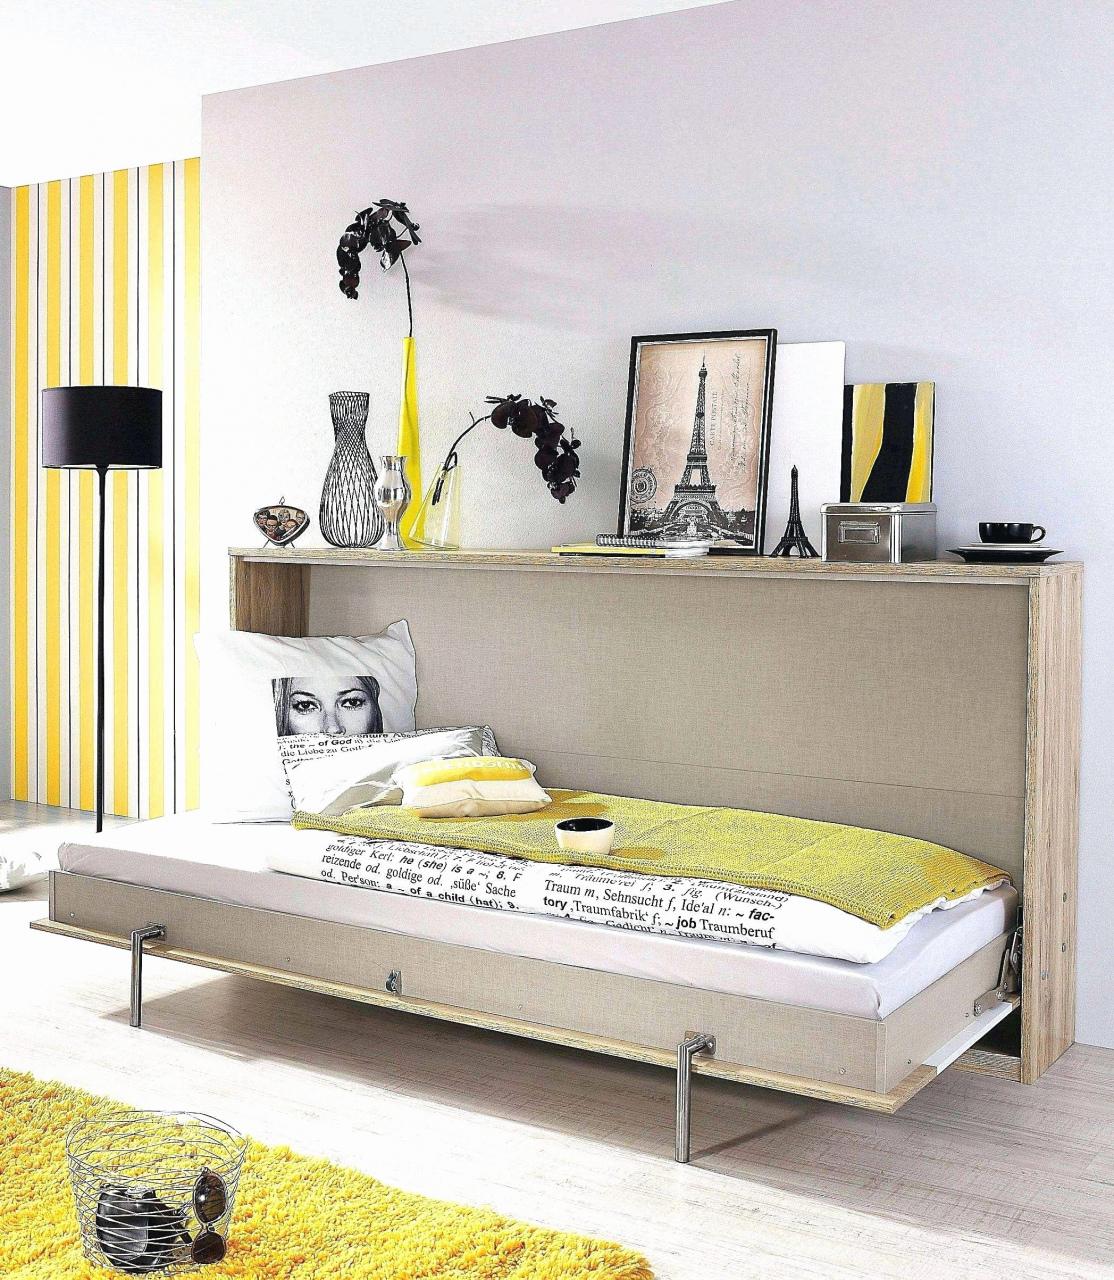 Full Size of Palettenbett Ikea 140x200 Malm Bettgestell Ersatzteile Zuhause Küche Kosten Betten Bei Sofa Mit Schlaffunktion Miniküche 160x200 Kaufen Modulküche Wohnzimmer Palettenbett Ikea